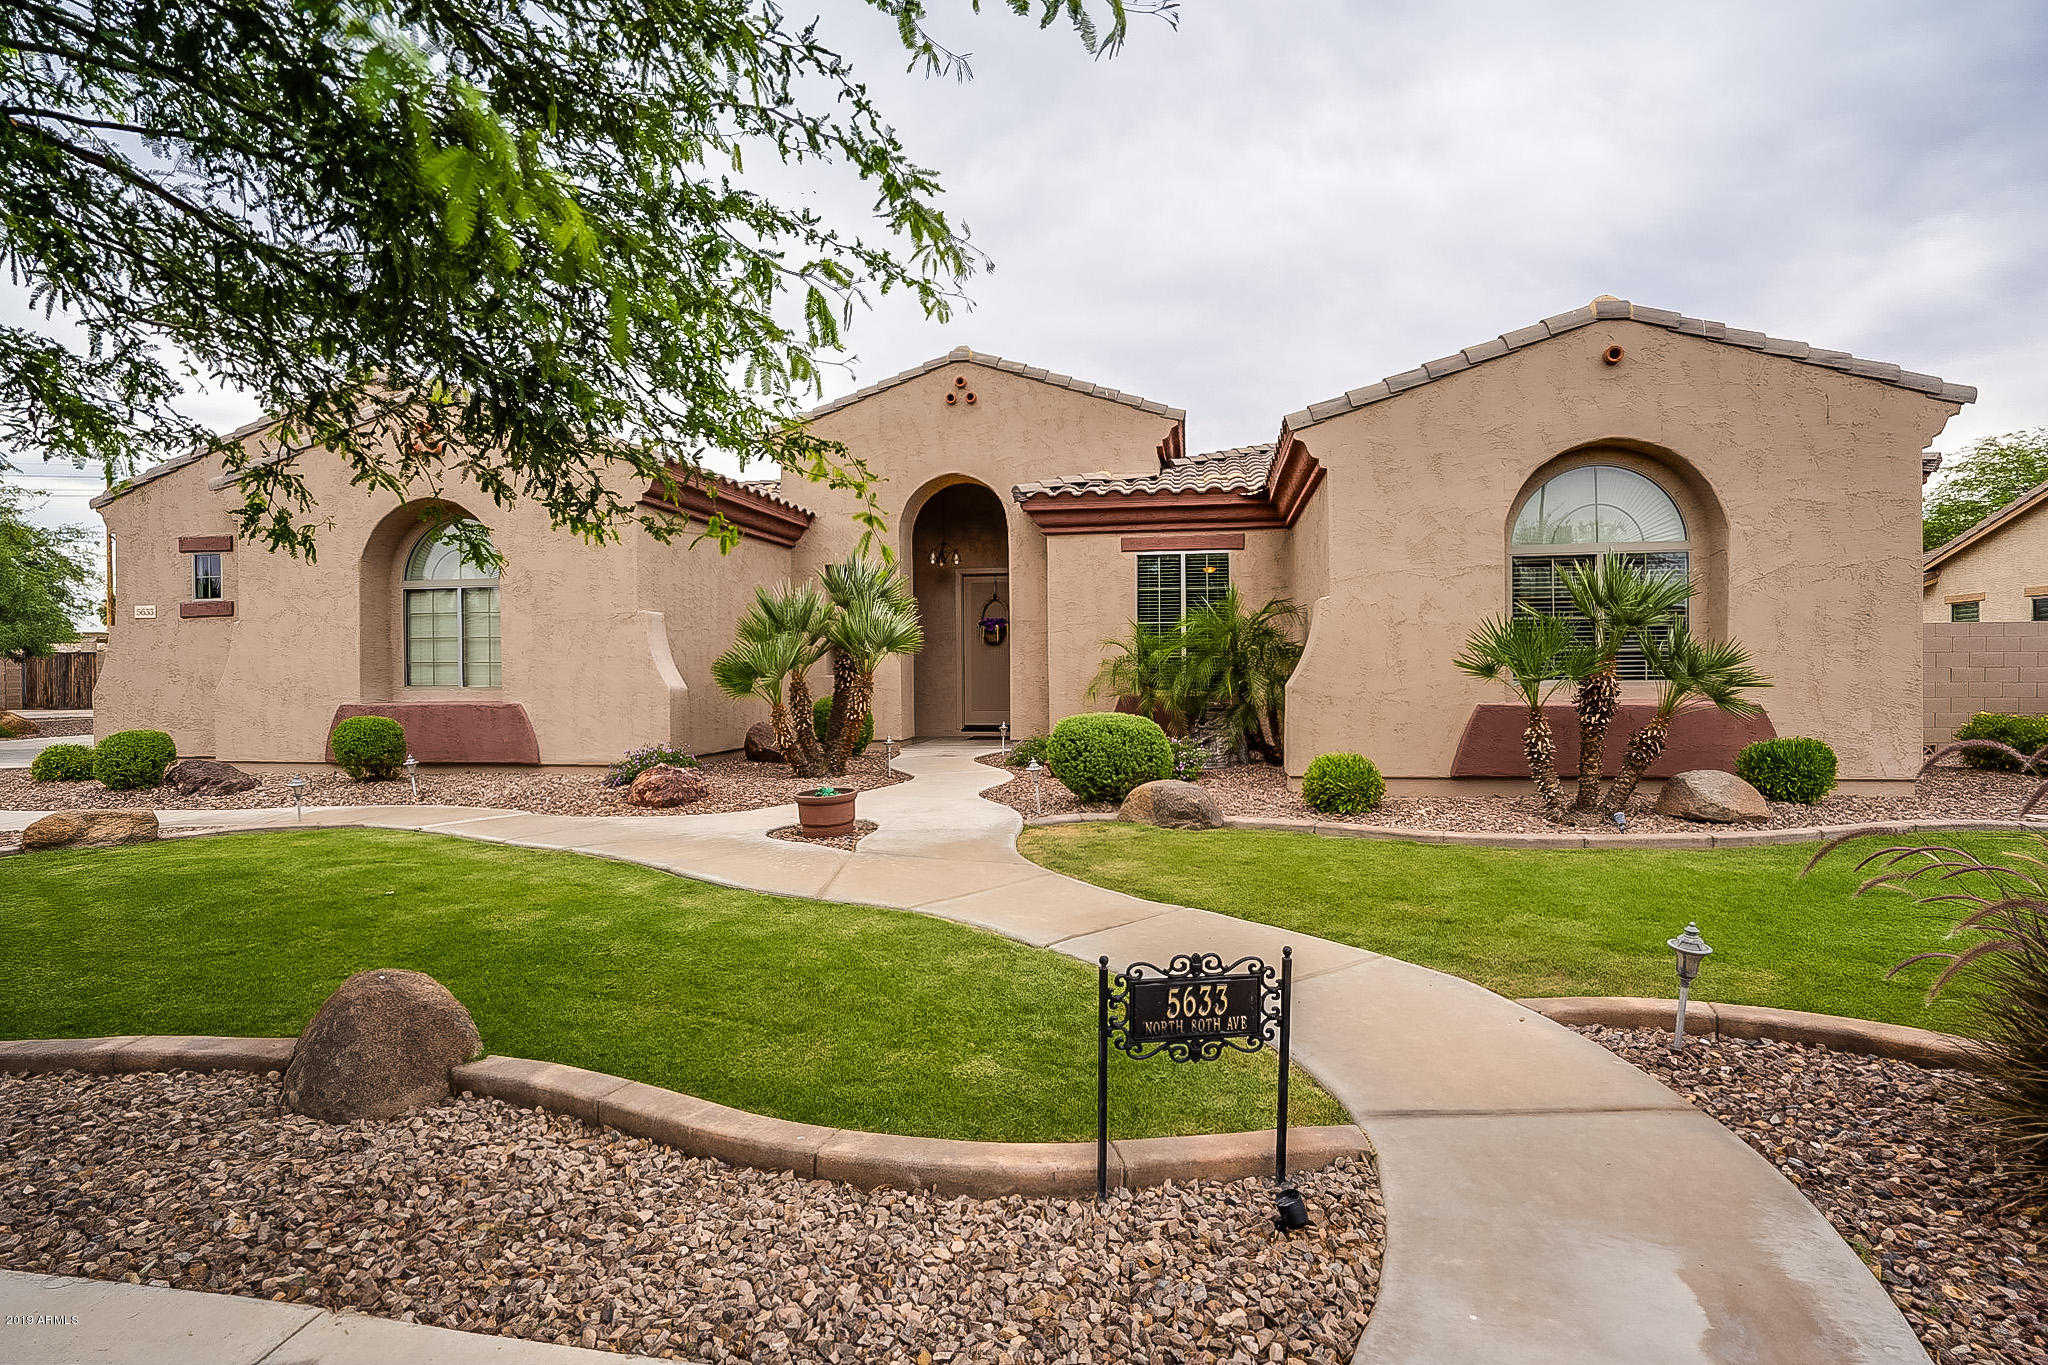 $400,000 - 3Br/3Ba - Home for Sale in Missouri Estates, Glendale